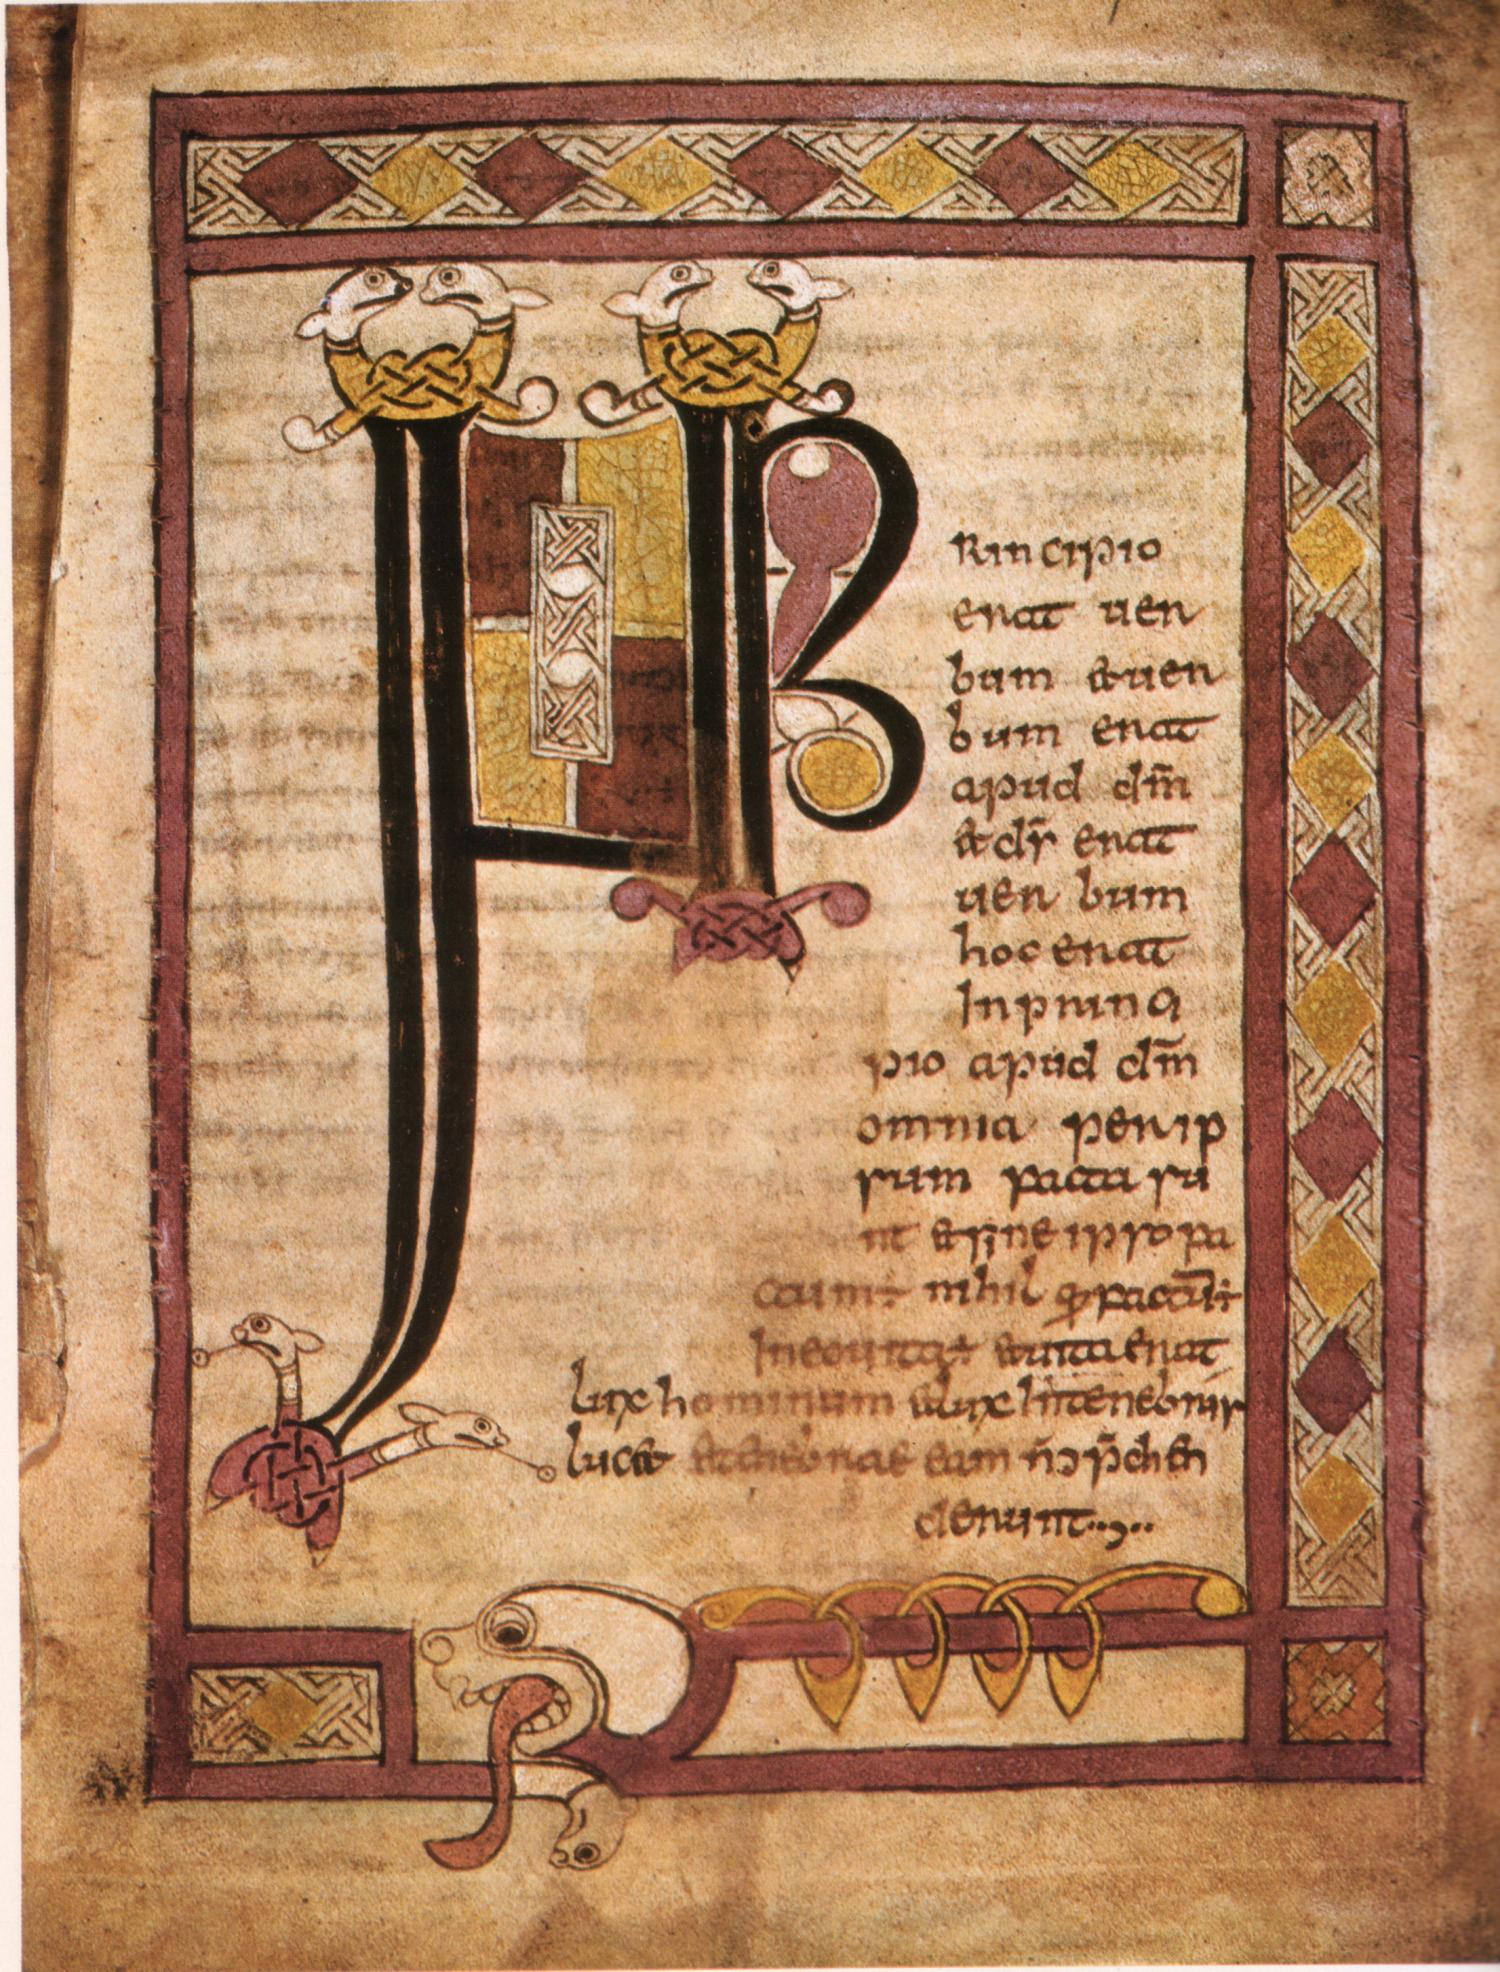 Stowe Missal inital page